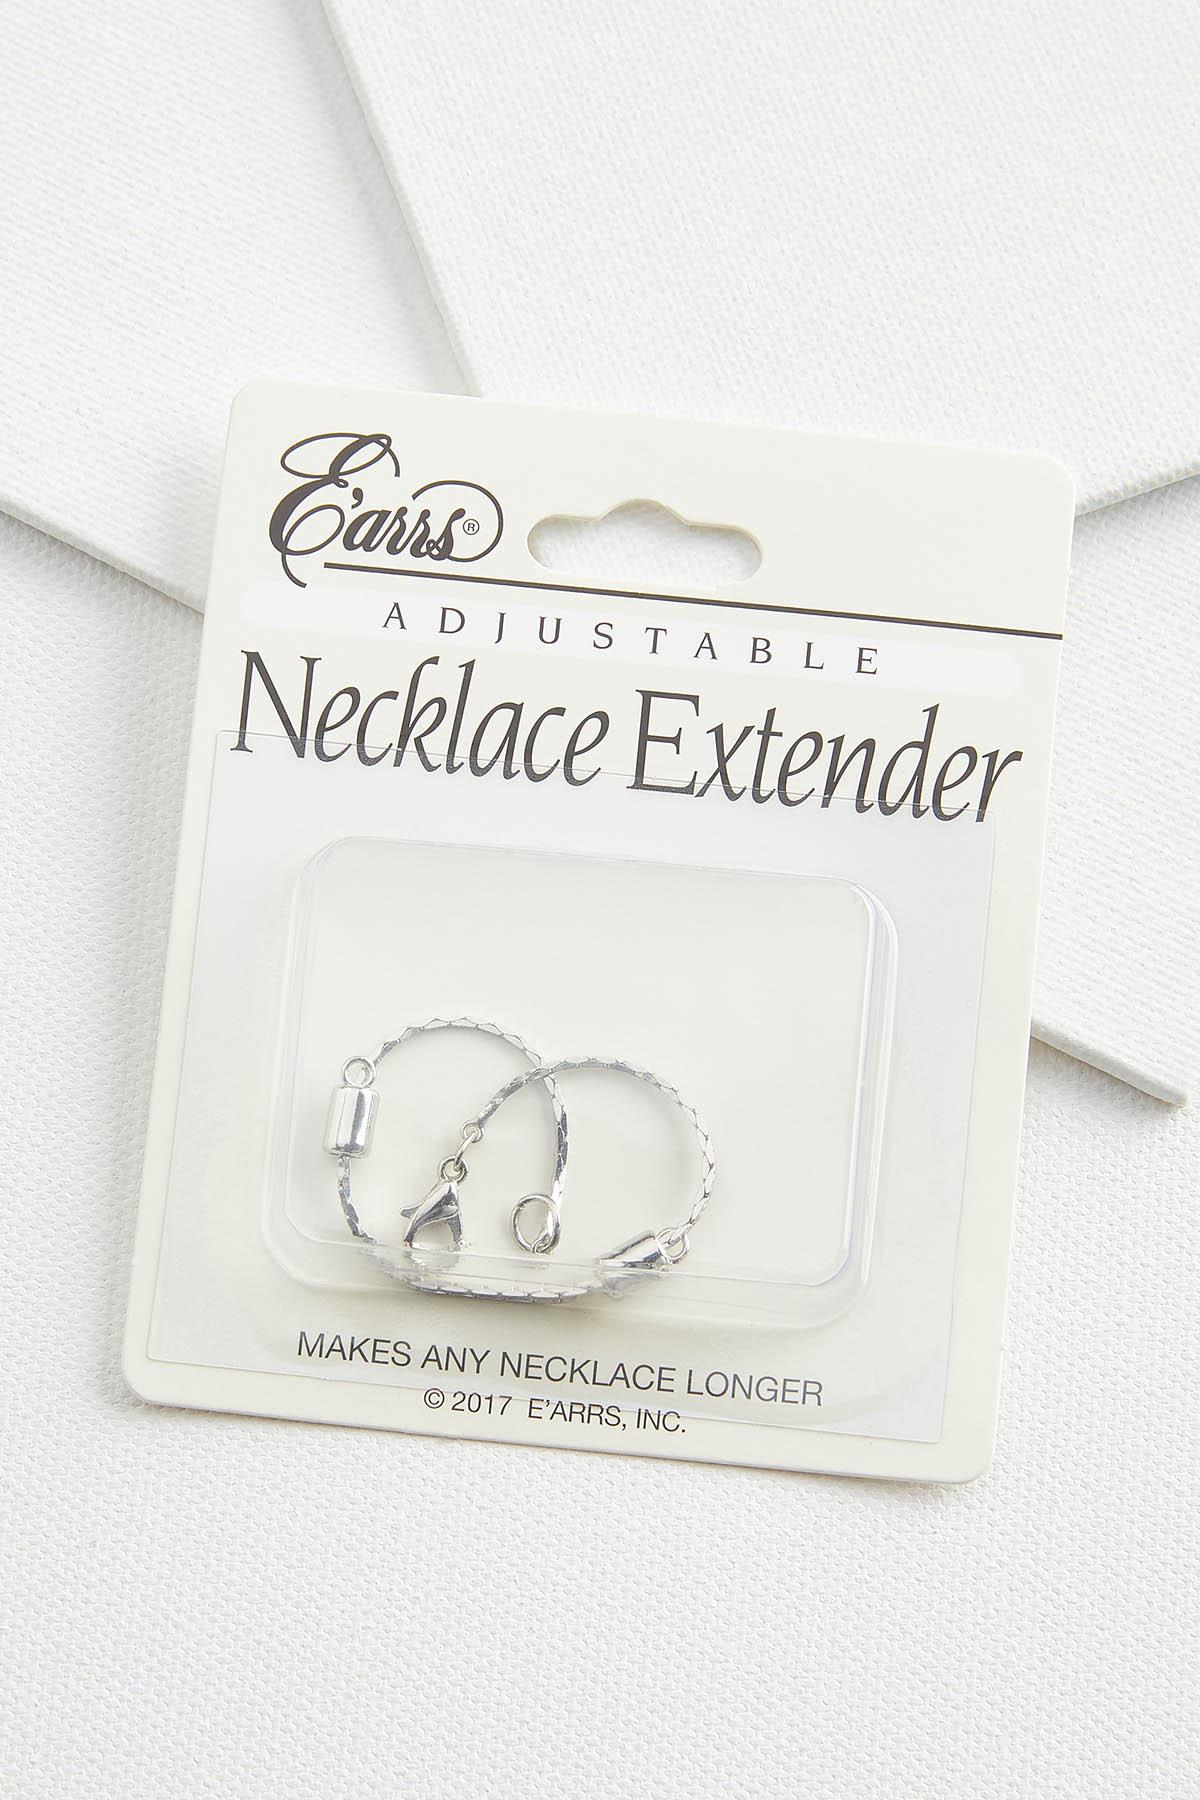 Necklace Extender